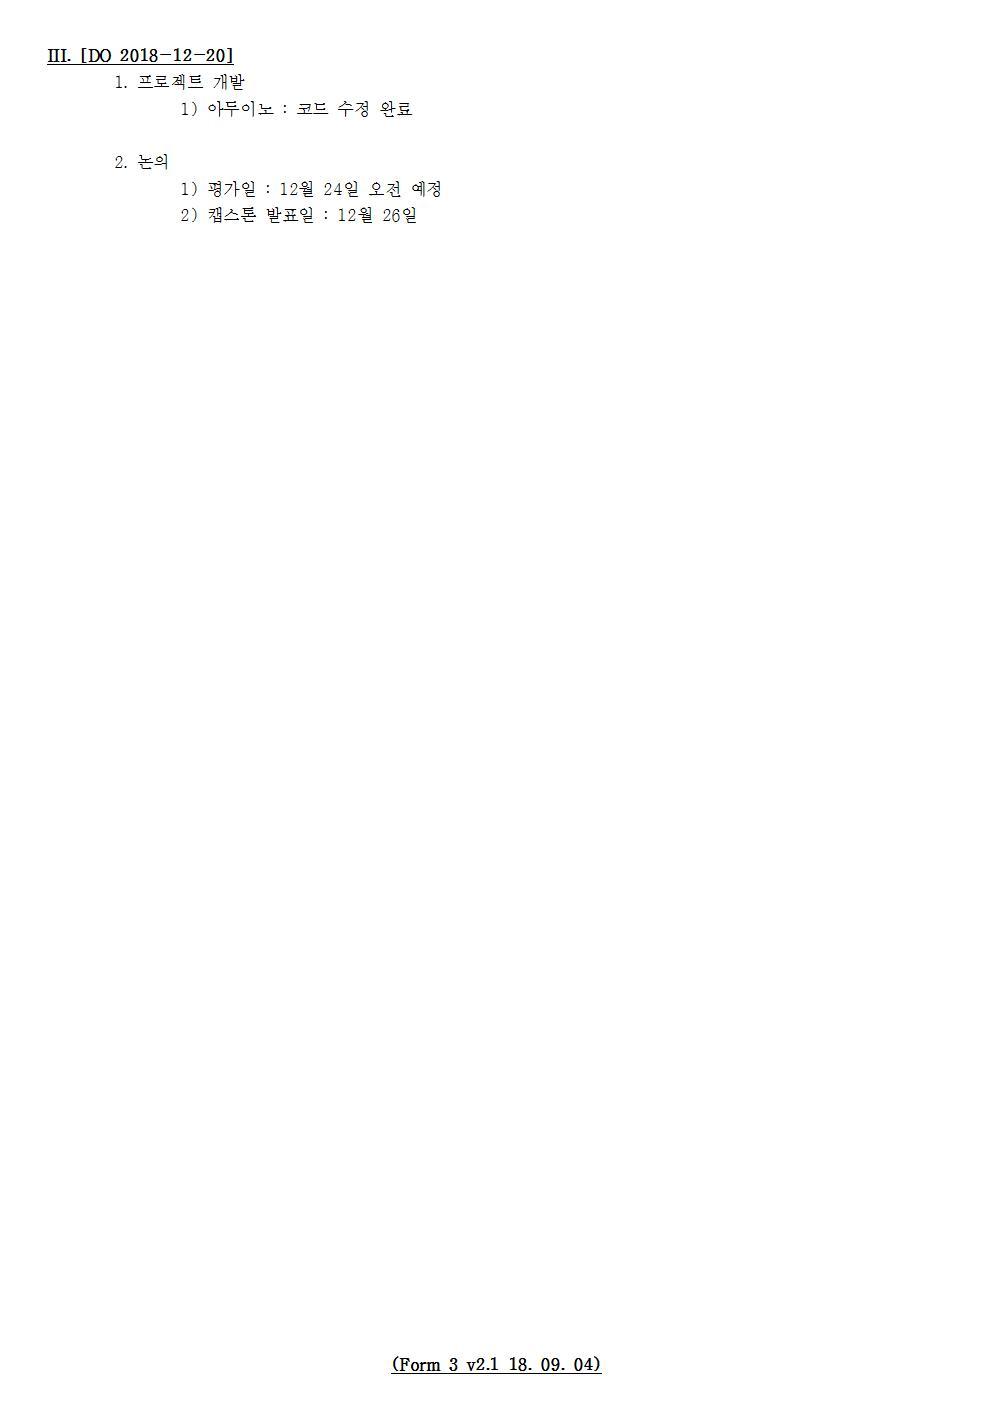 D-[18-049-LC-02]-[MM]-[2018-12-20][HH]002.jpg